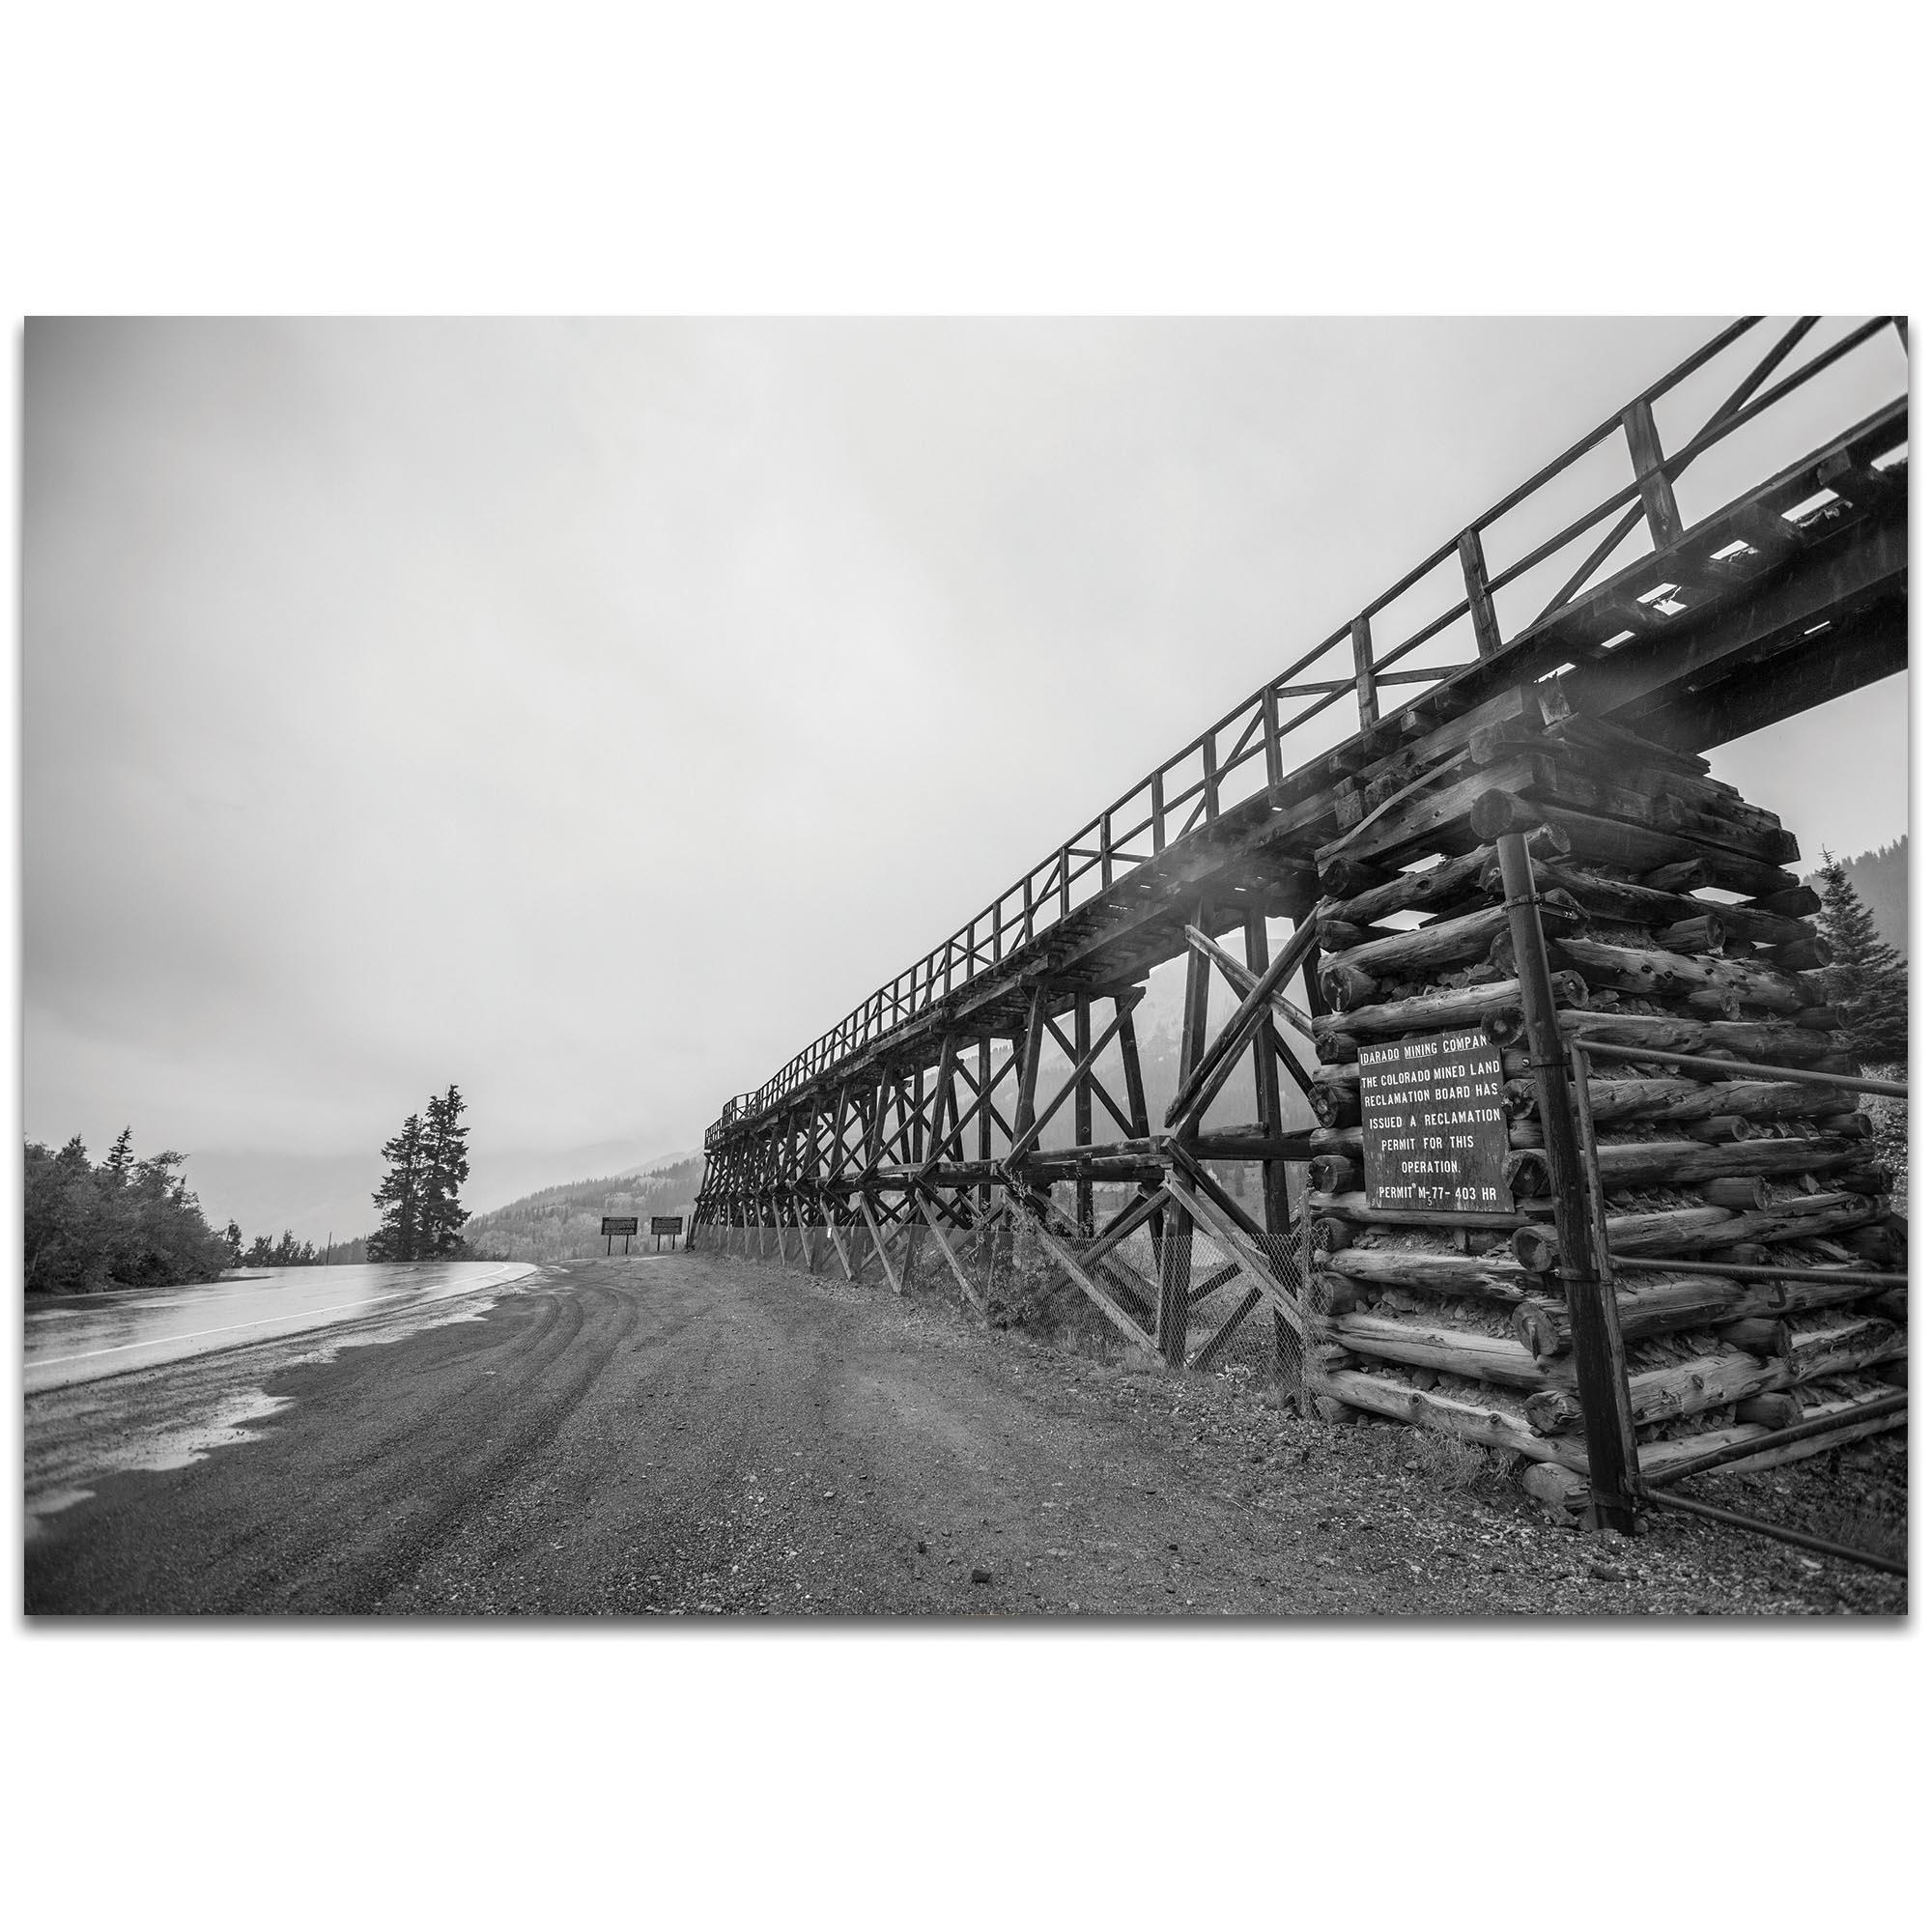 Western Wall Art 'Old Railroad Bridge' - Bridges Decor on Metal or Plexiglass